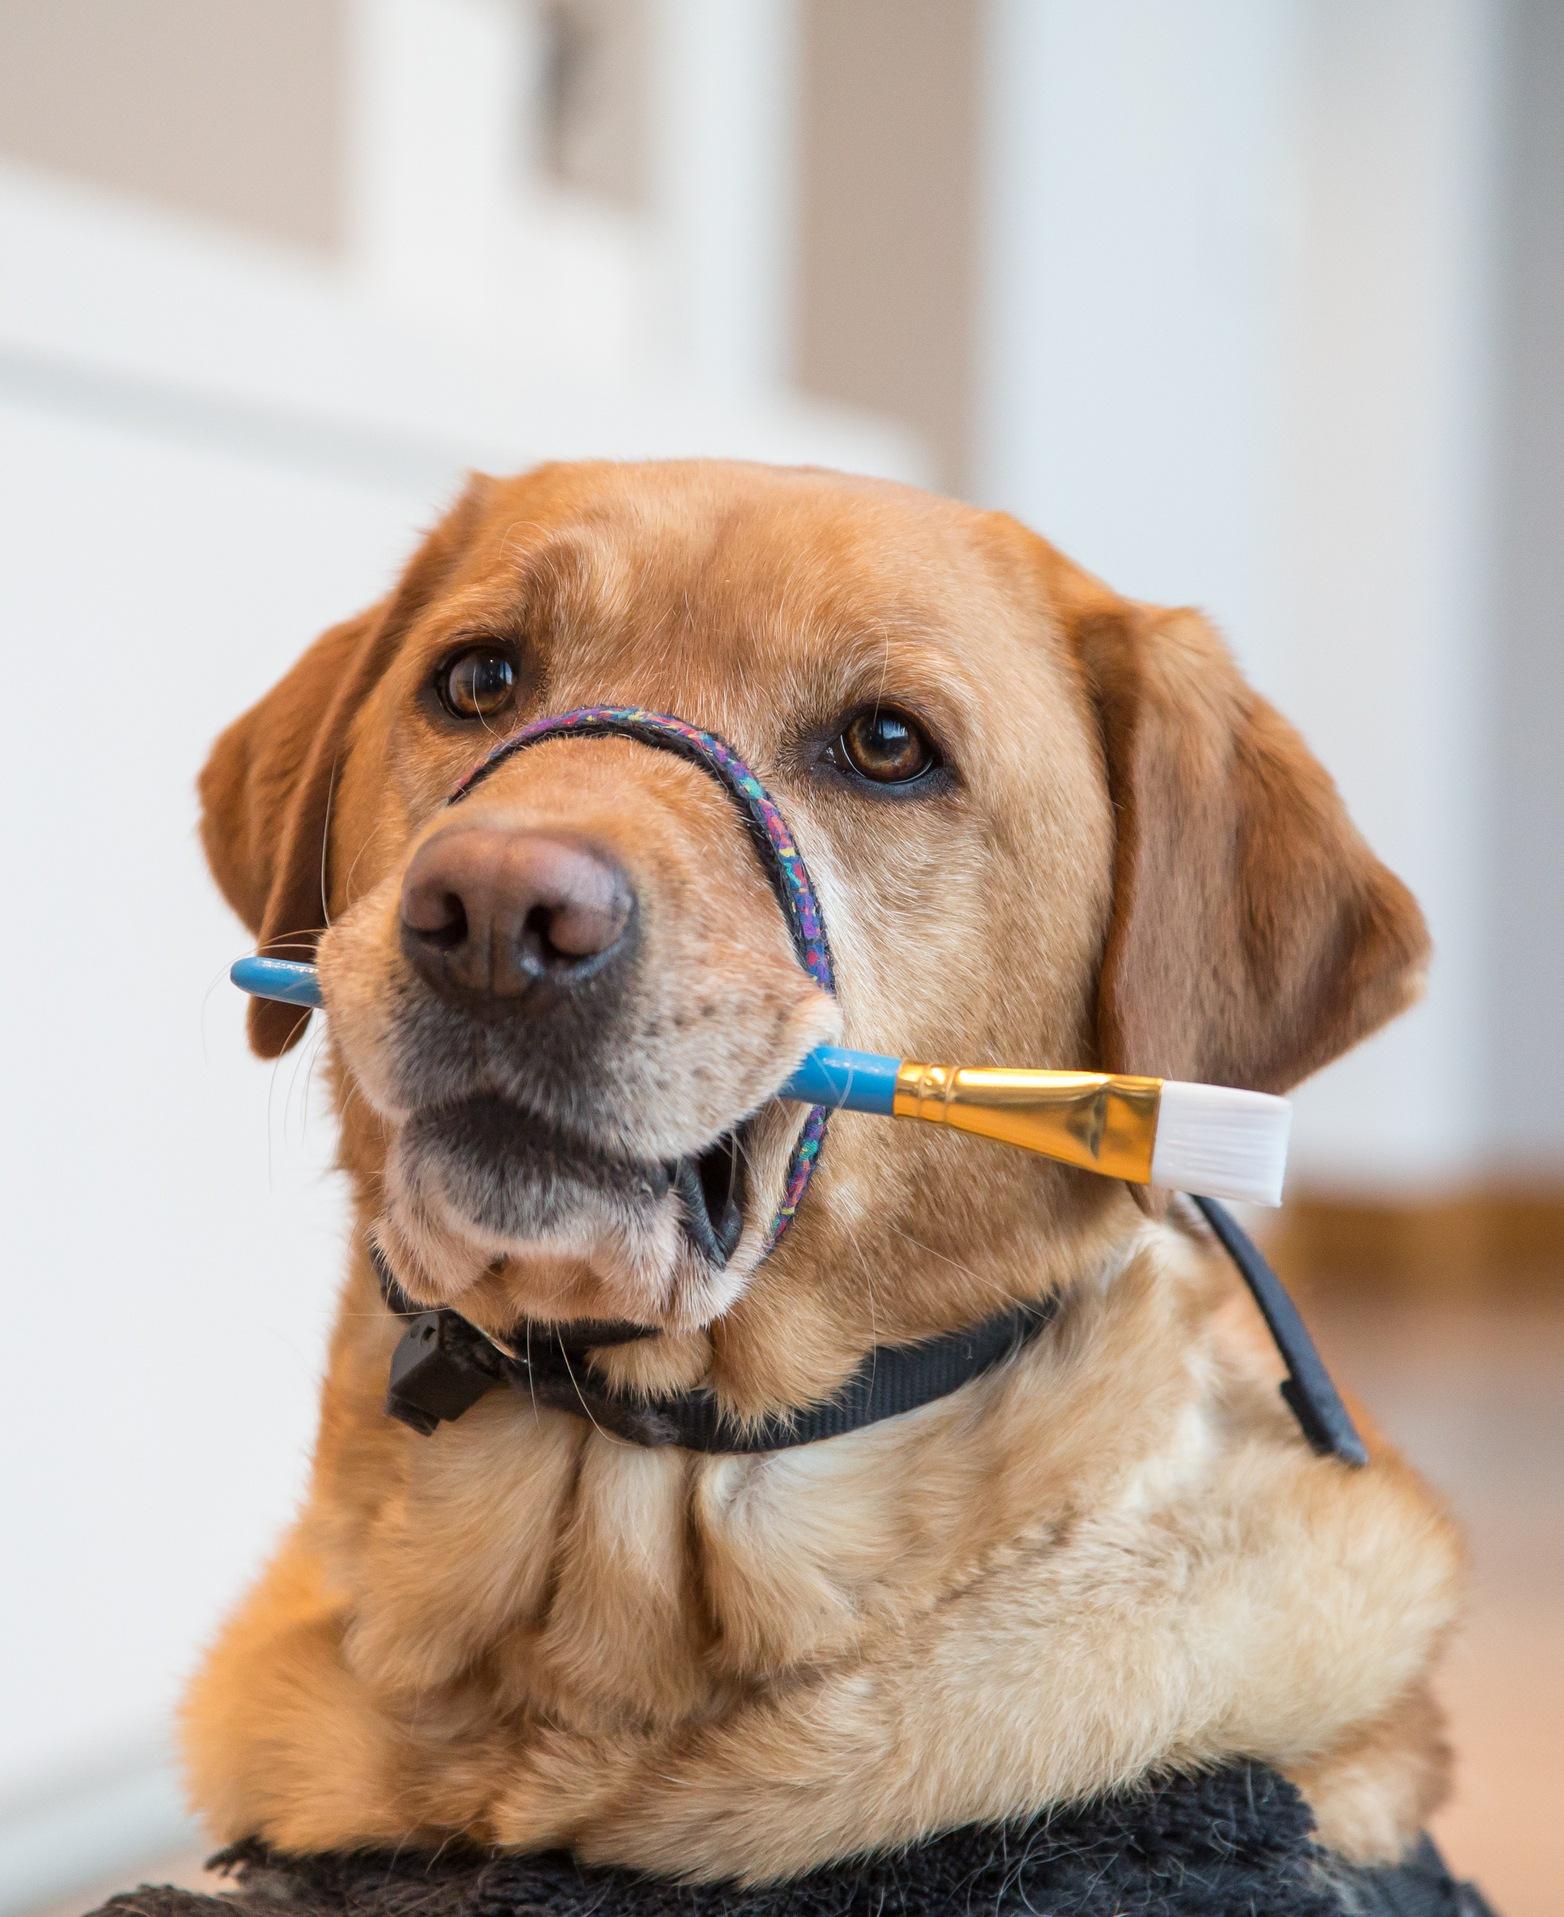 dog with paint brush